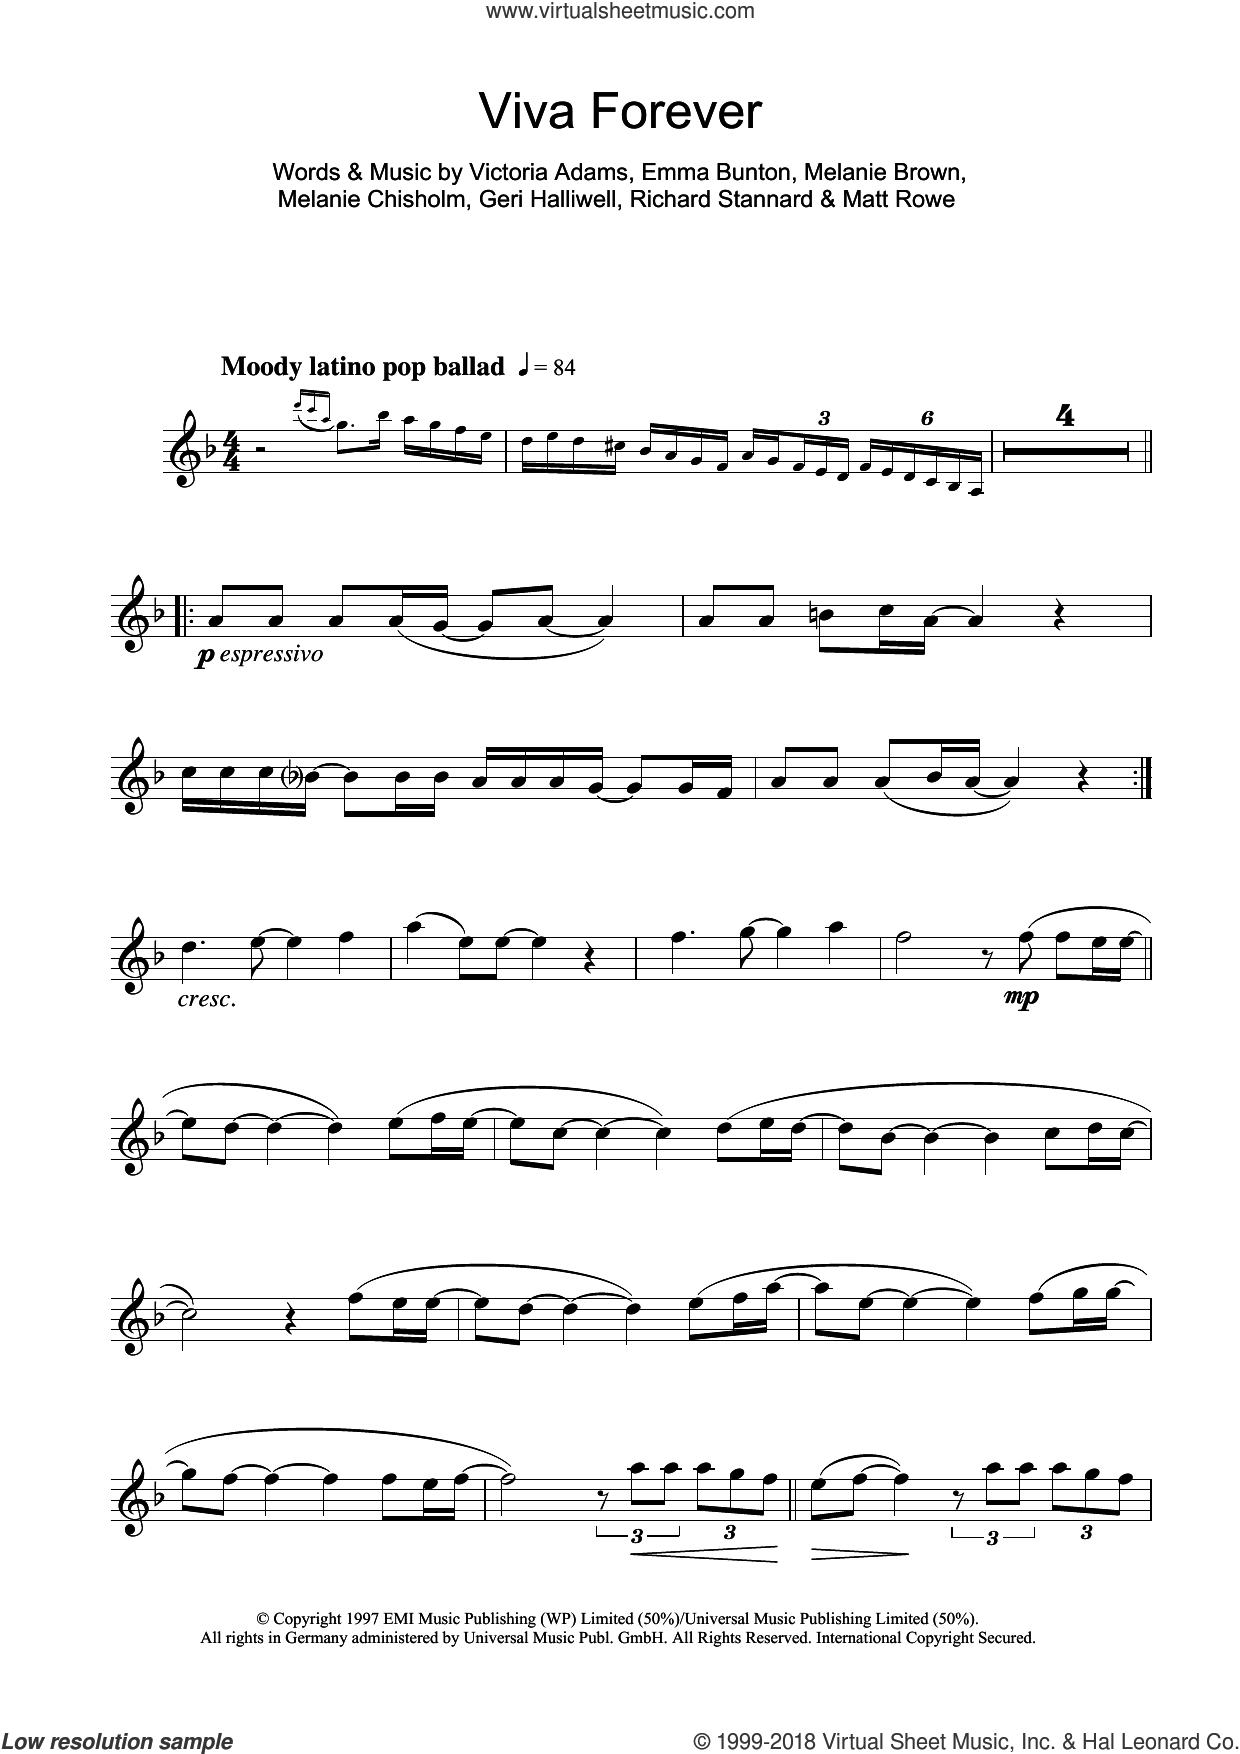 Viva Forever sheet music for flute solo by Spice Girls, Chisholm Melanie, Emma Bunton, Geri Halliwell, Matt Rowe, Melanie Brown, Richard Stannard and Victoria Adams, intermediate skill level